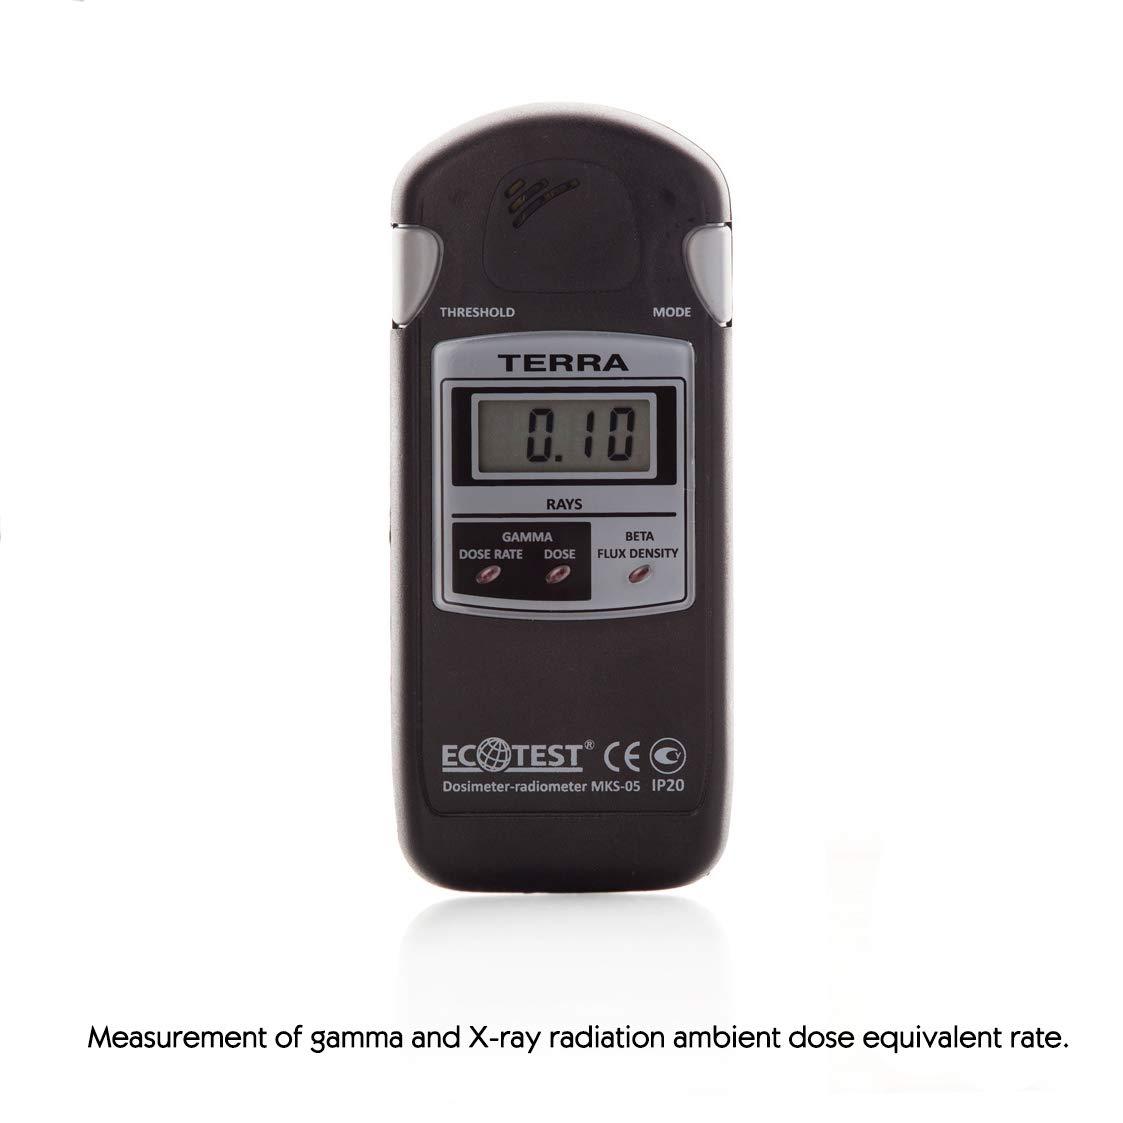 Dosimeter-Radiometer МКS-05, Terra, Detector Radiation, Geiger Counter, PDF-Instruction of use: Amazon.com: Industrial & Scientific